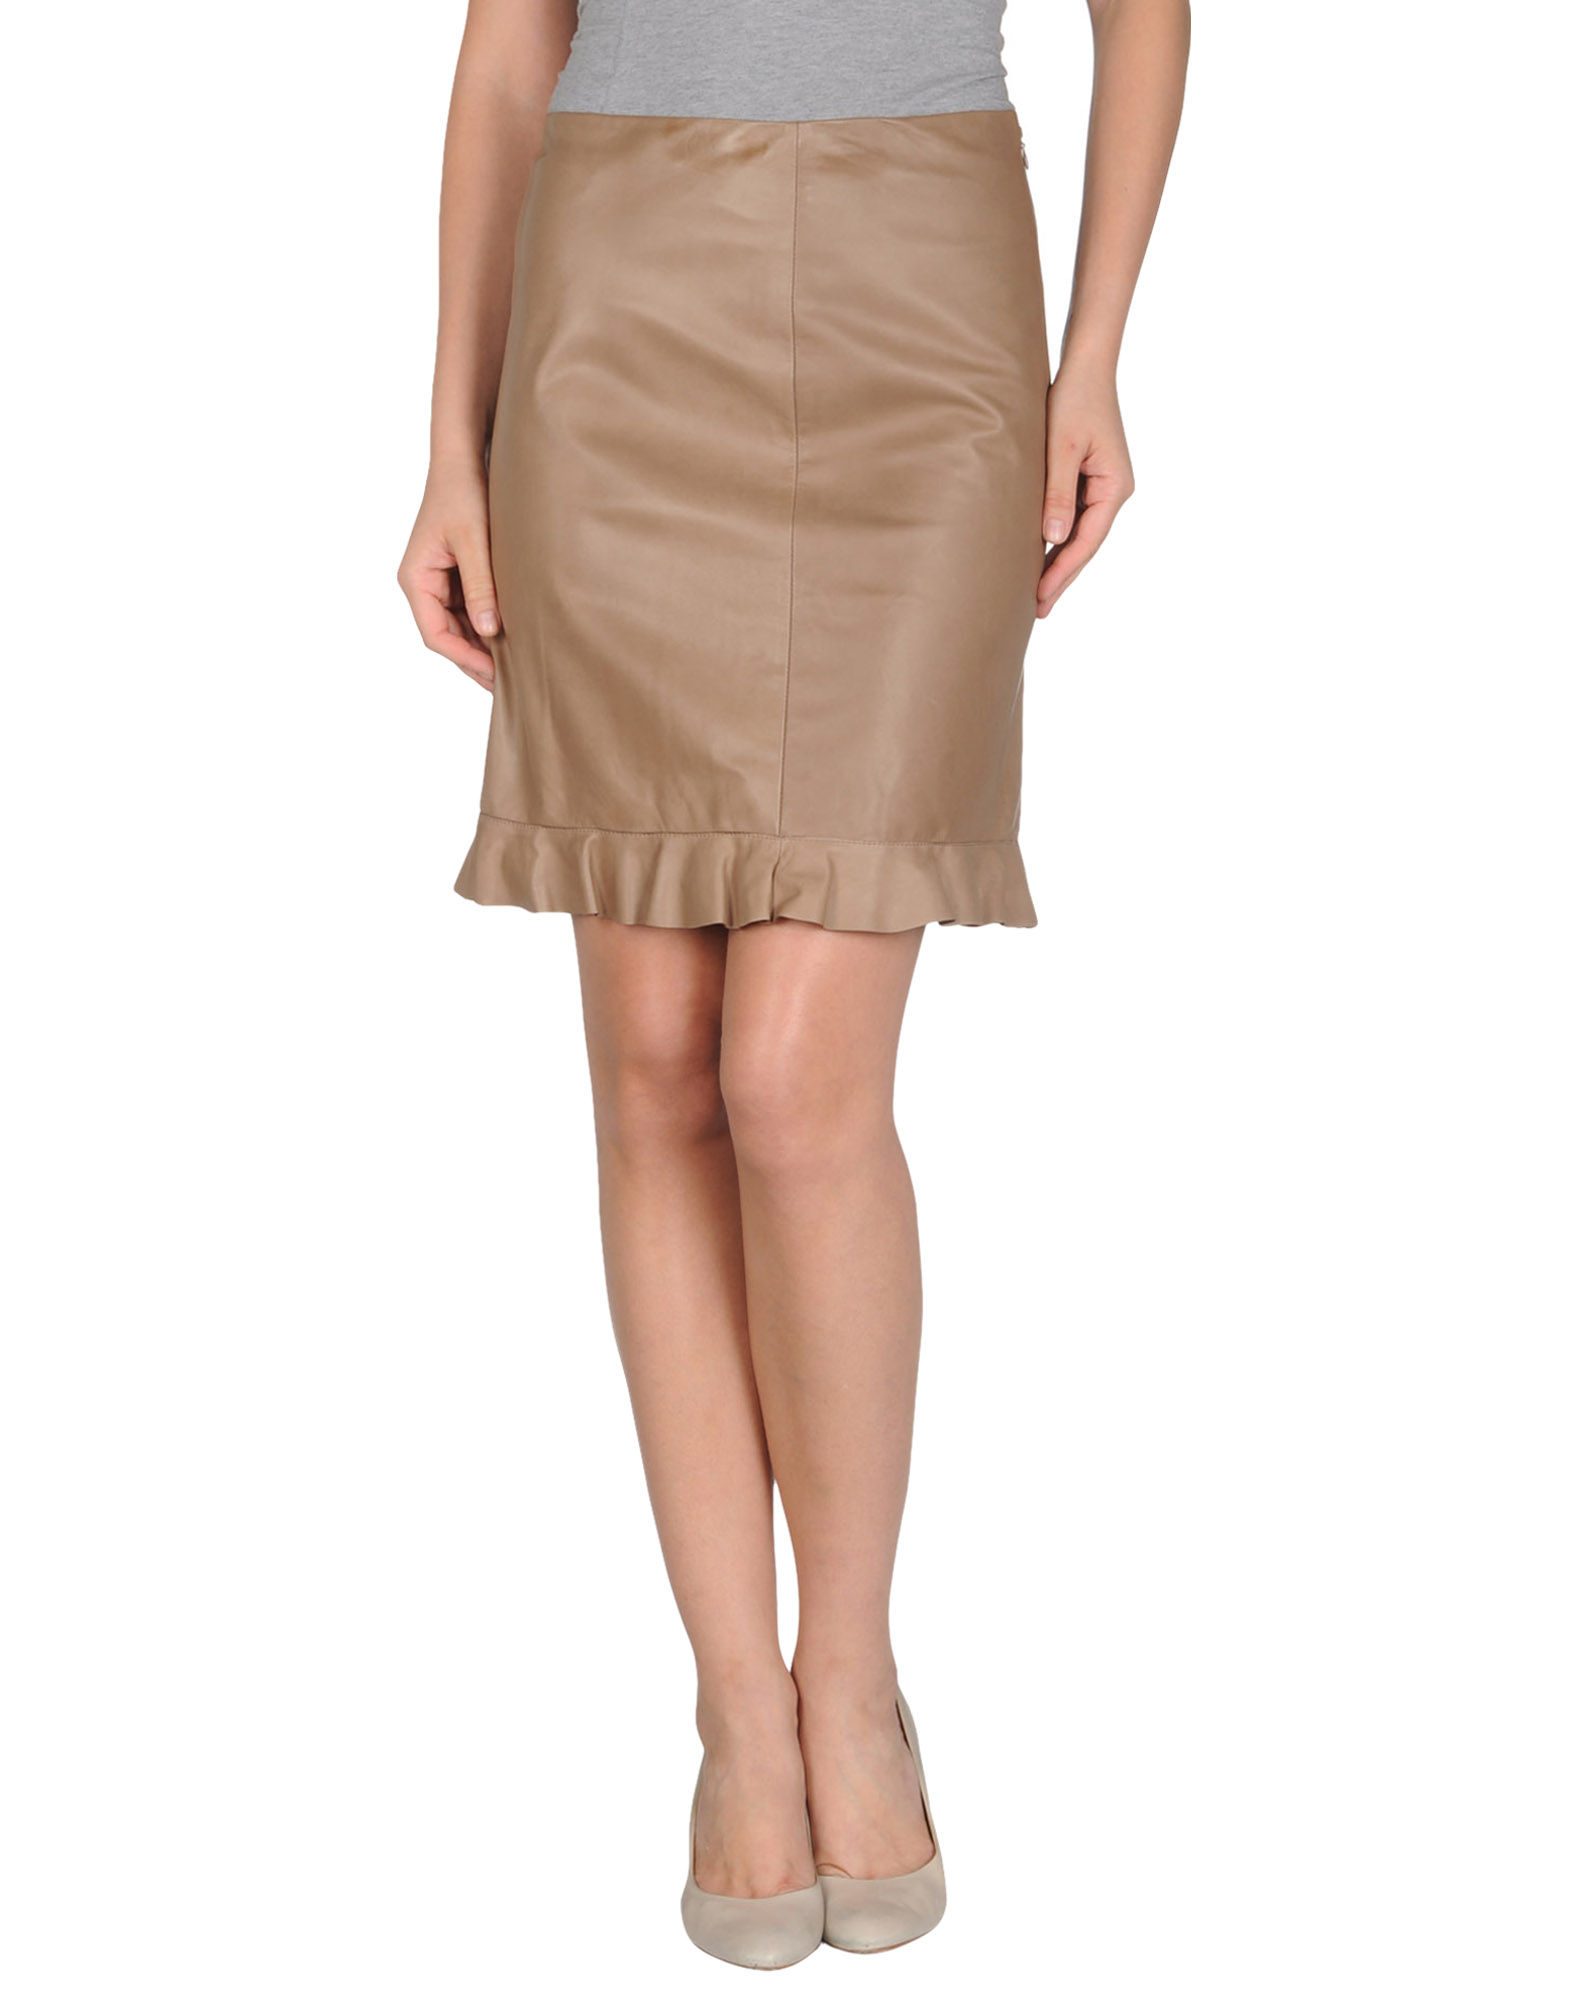 jil sander navy leather skirts in brown light brown lyst